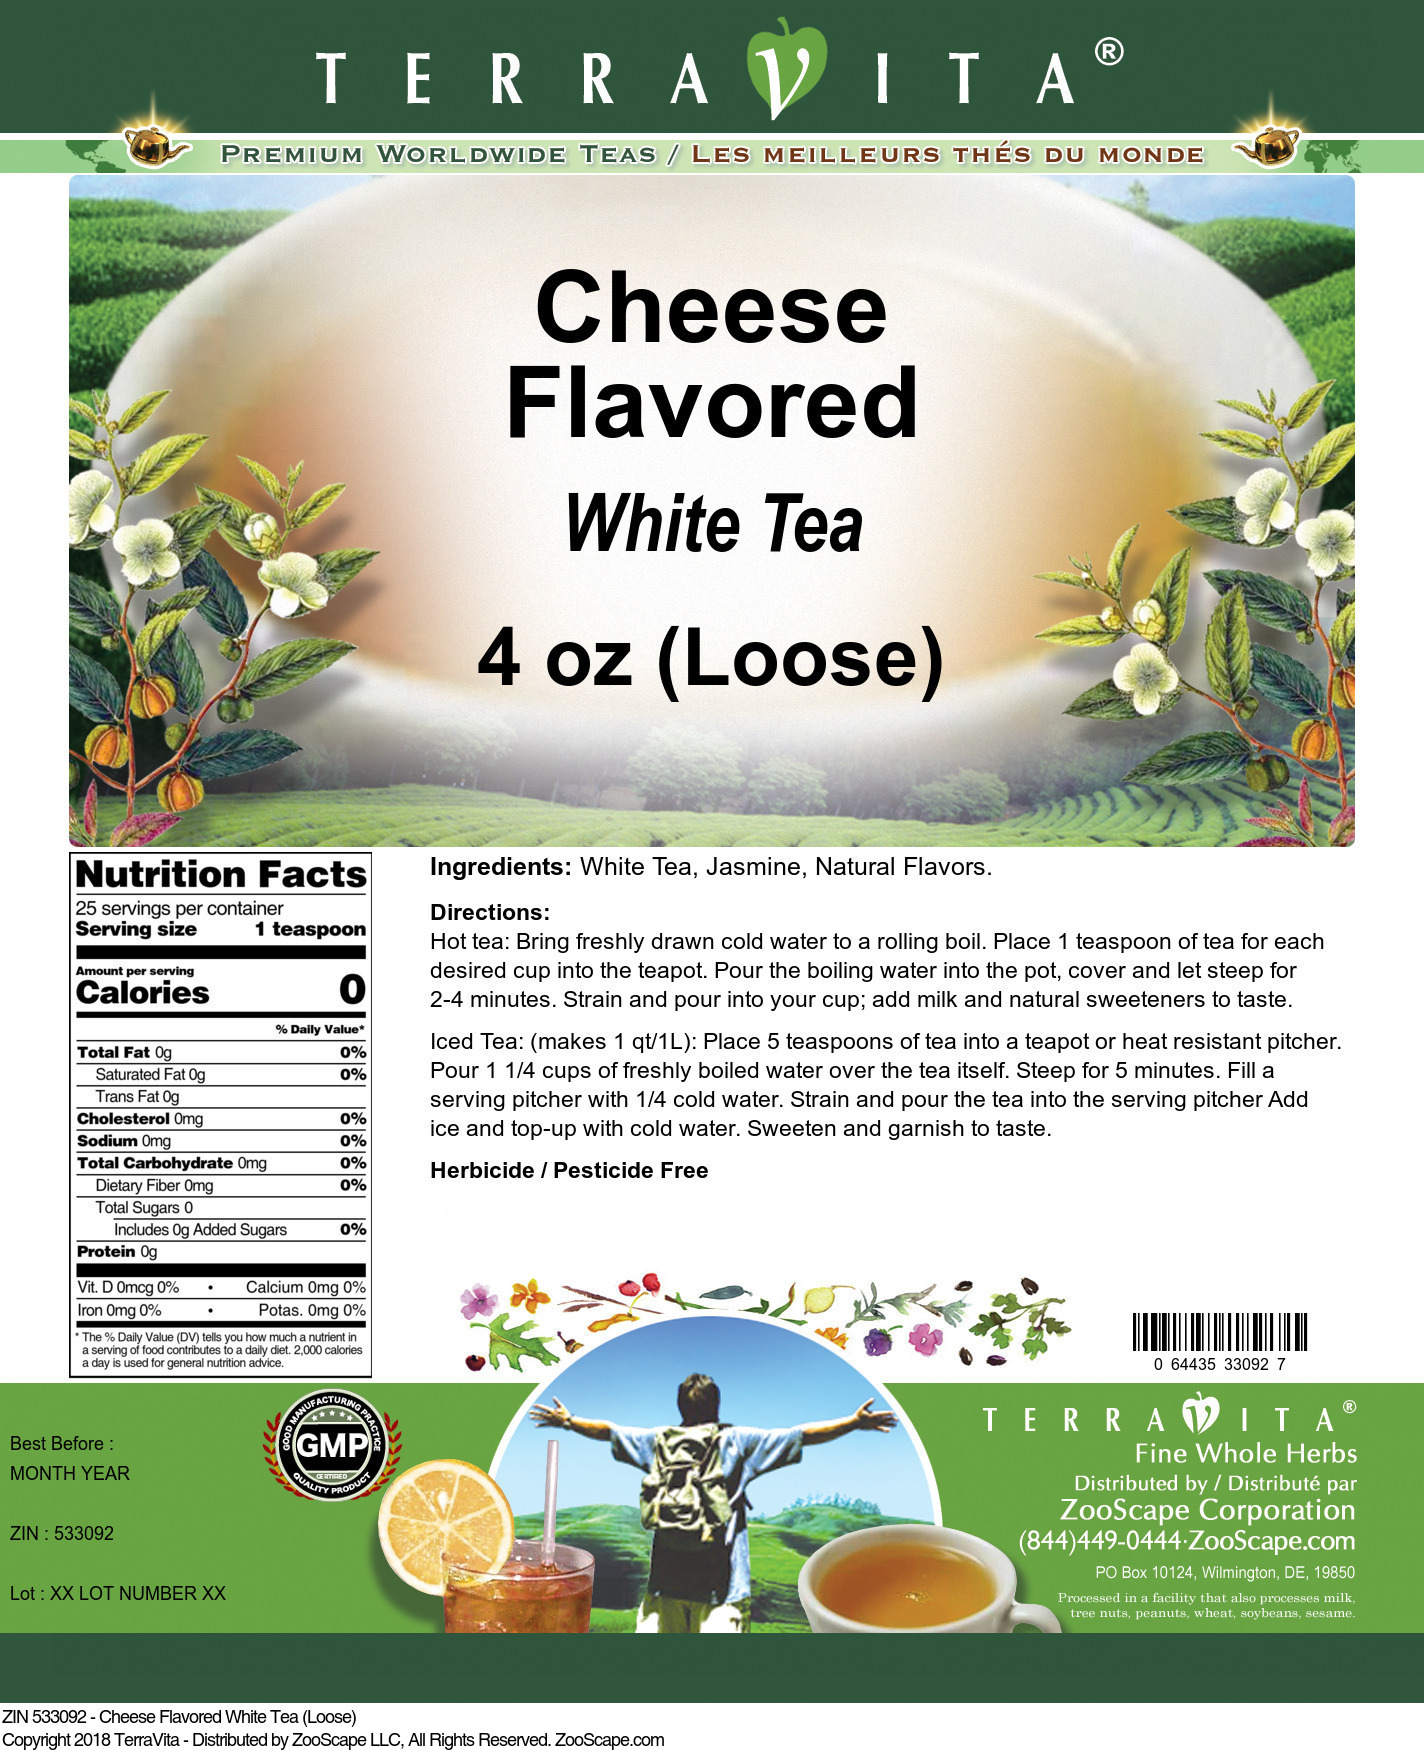 Cheese Flavored White Tea